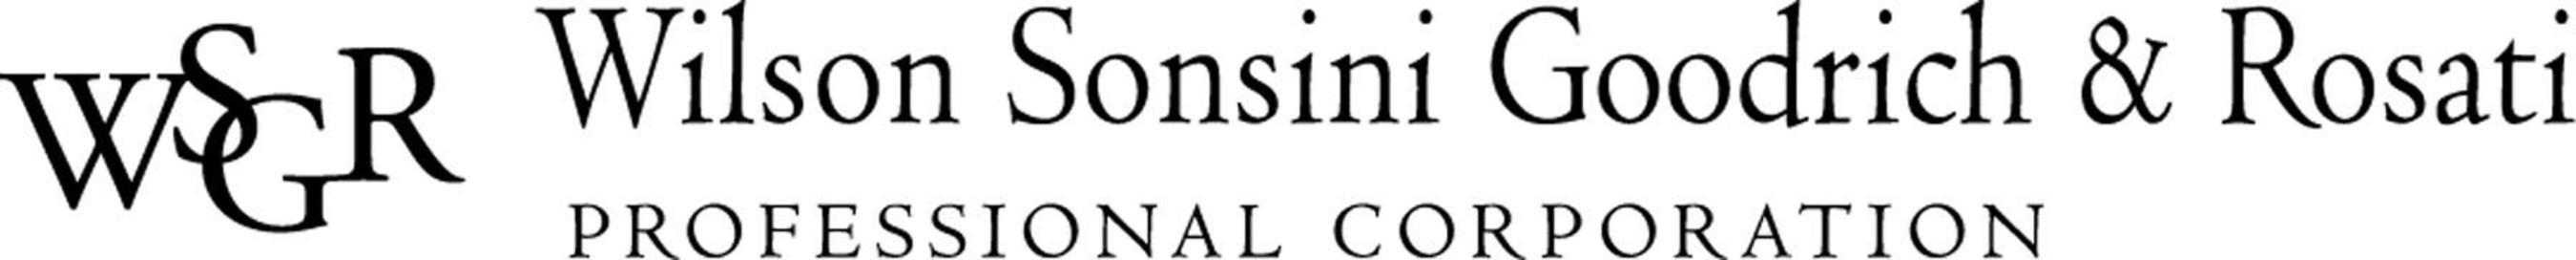 Wilson Sonsini Goodrich & Rosati logo.